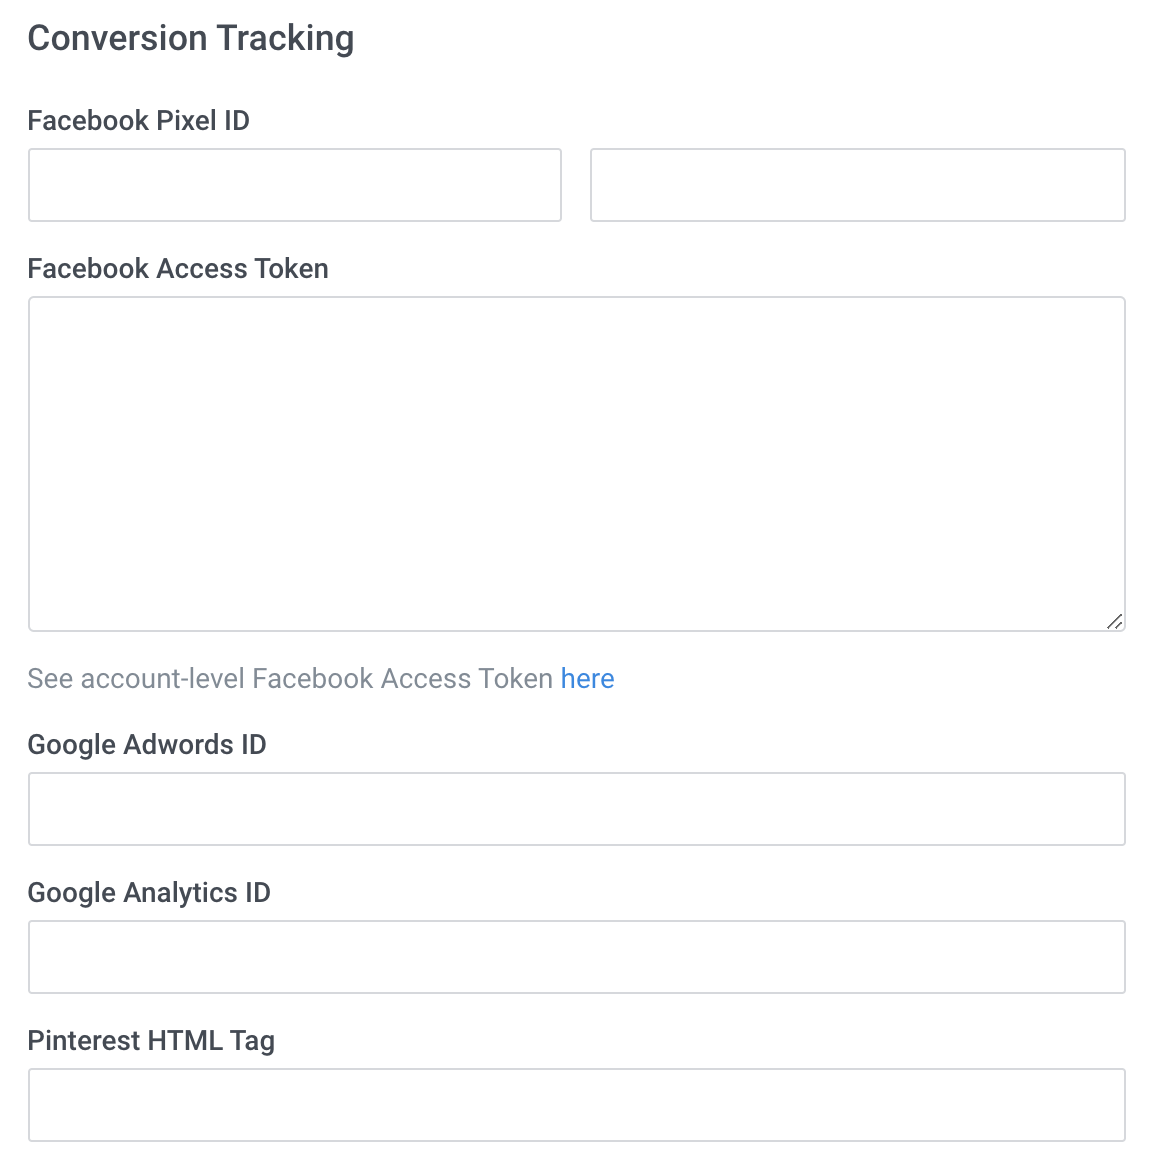 Domains > Domain Settings - Domain level conversion tracking